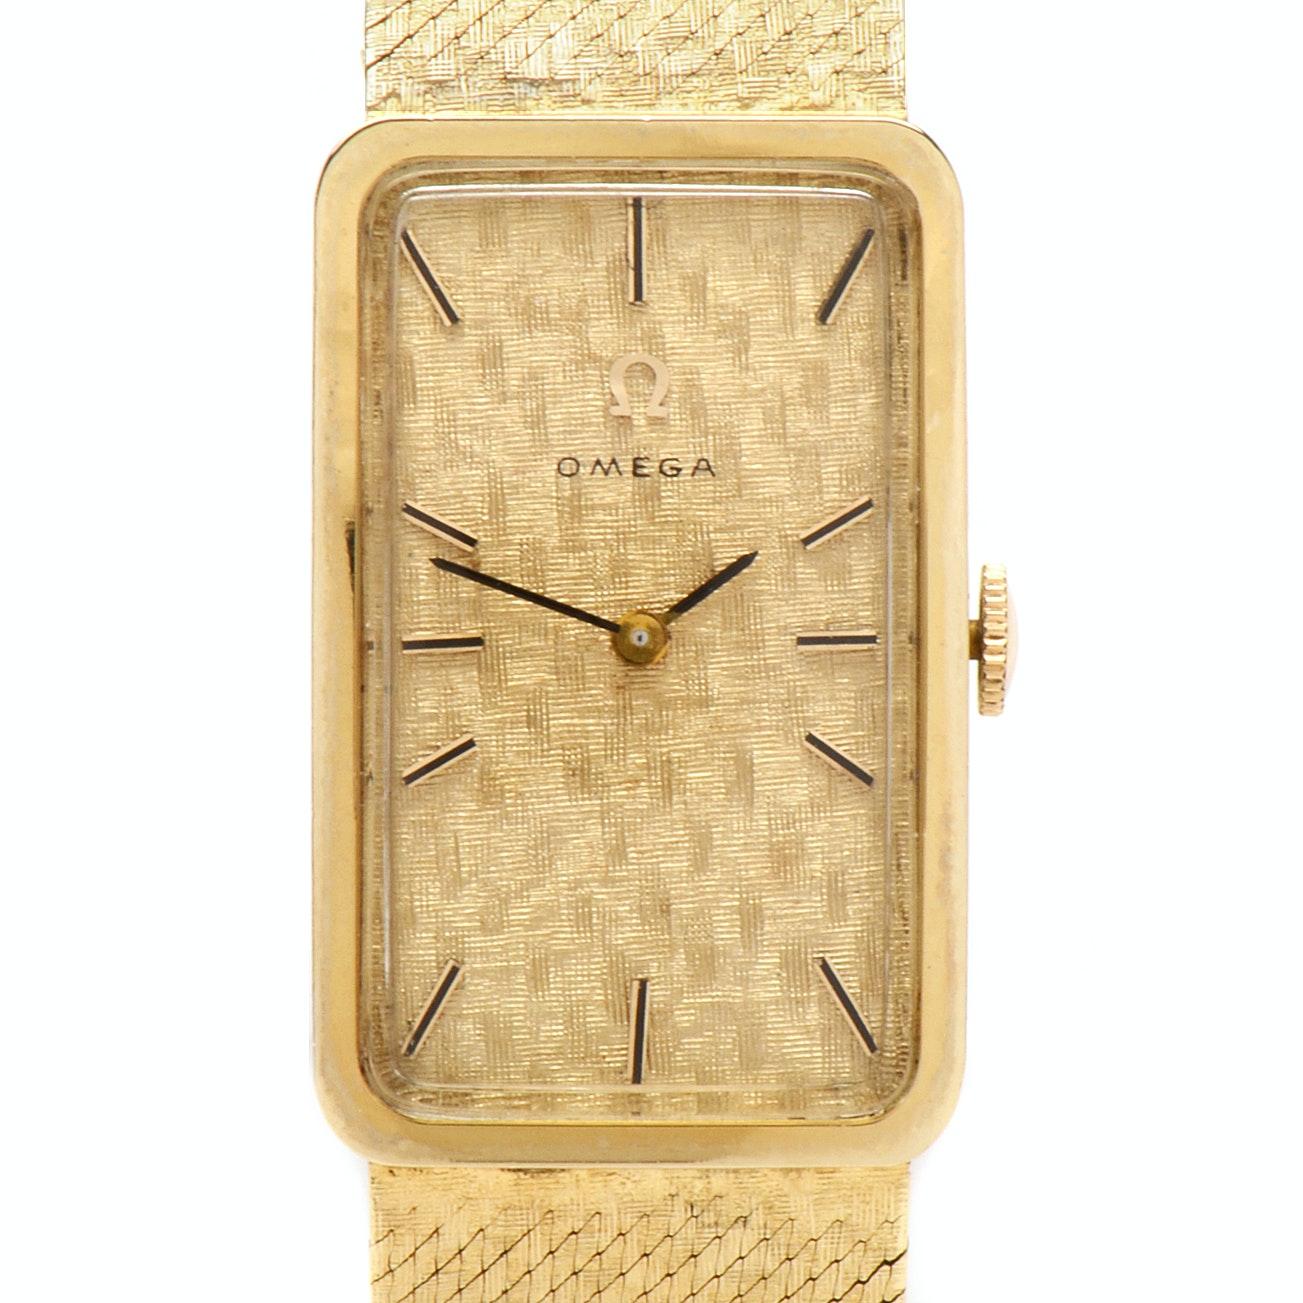 Omega 14K Yellow Gold Manual Wind Wristwatch